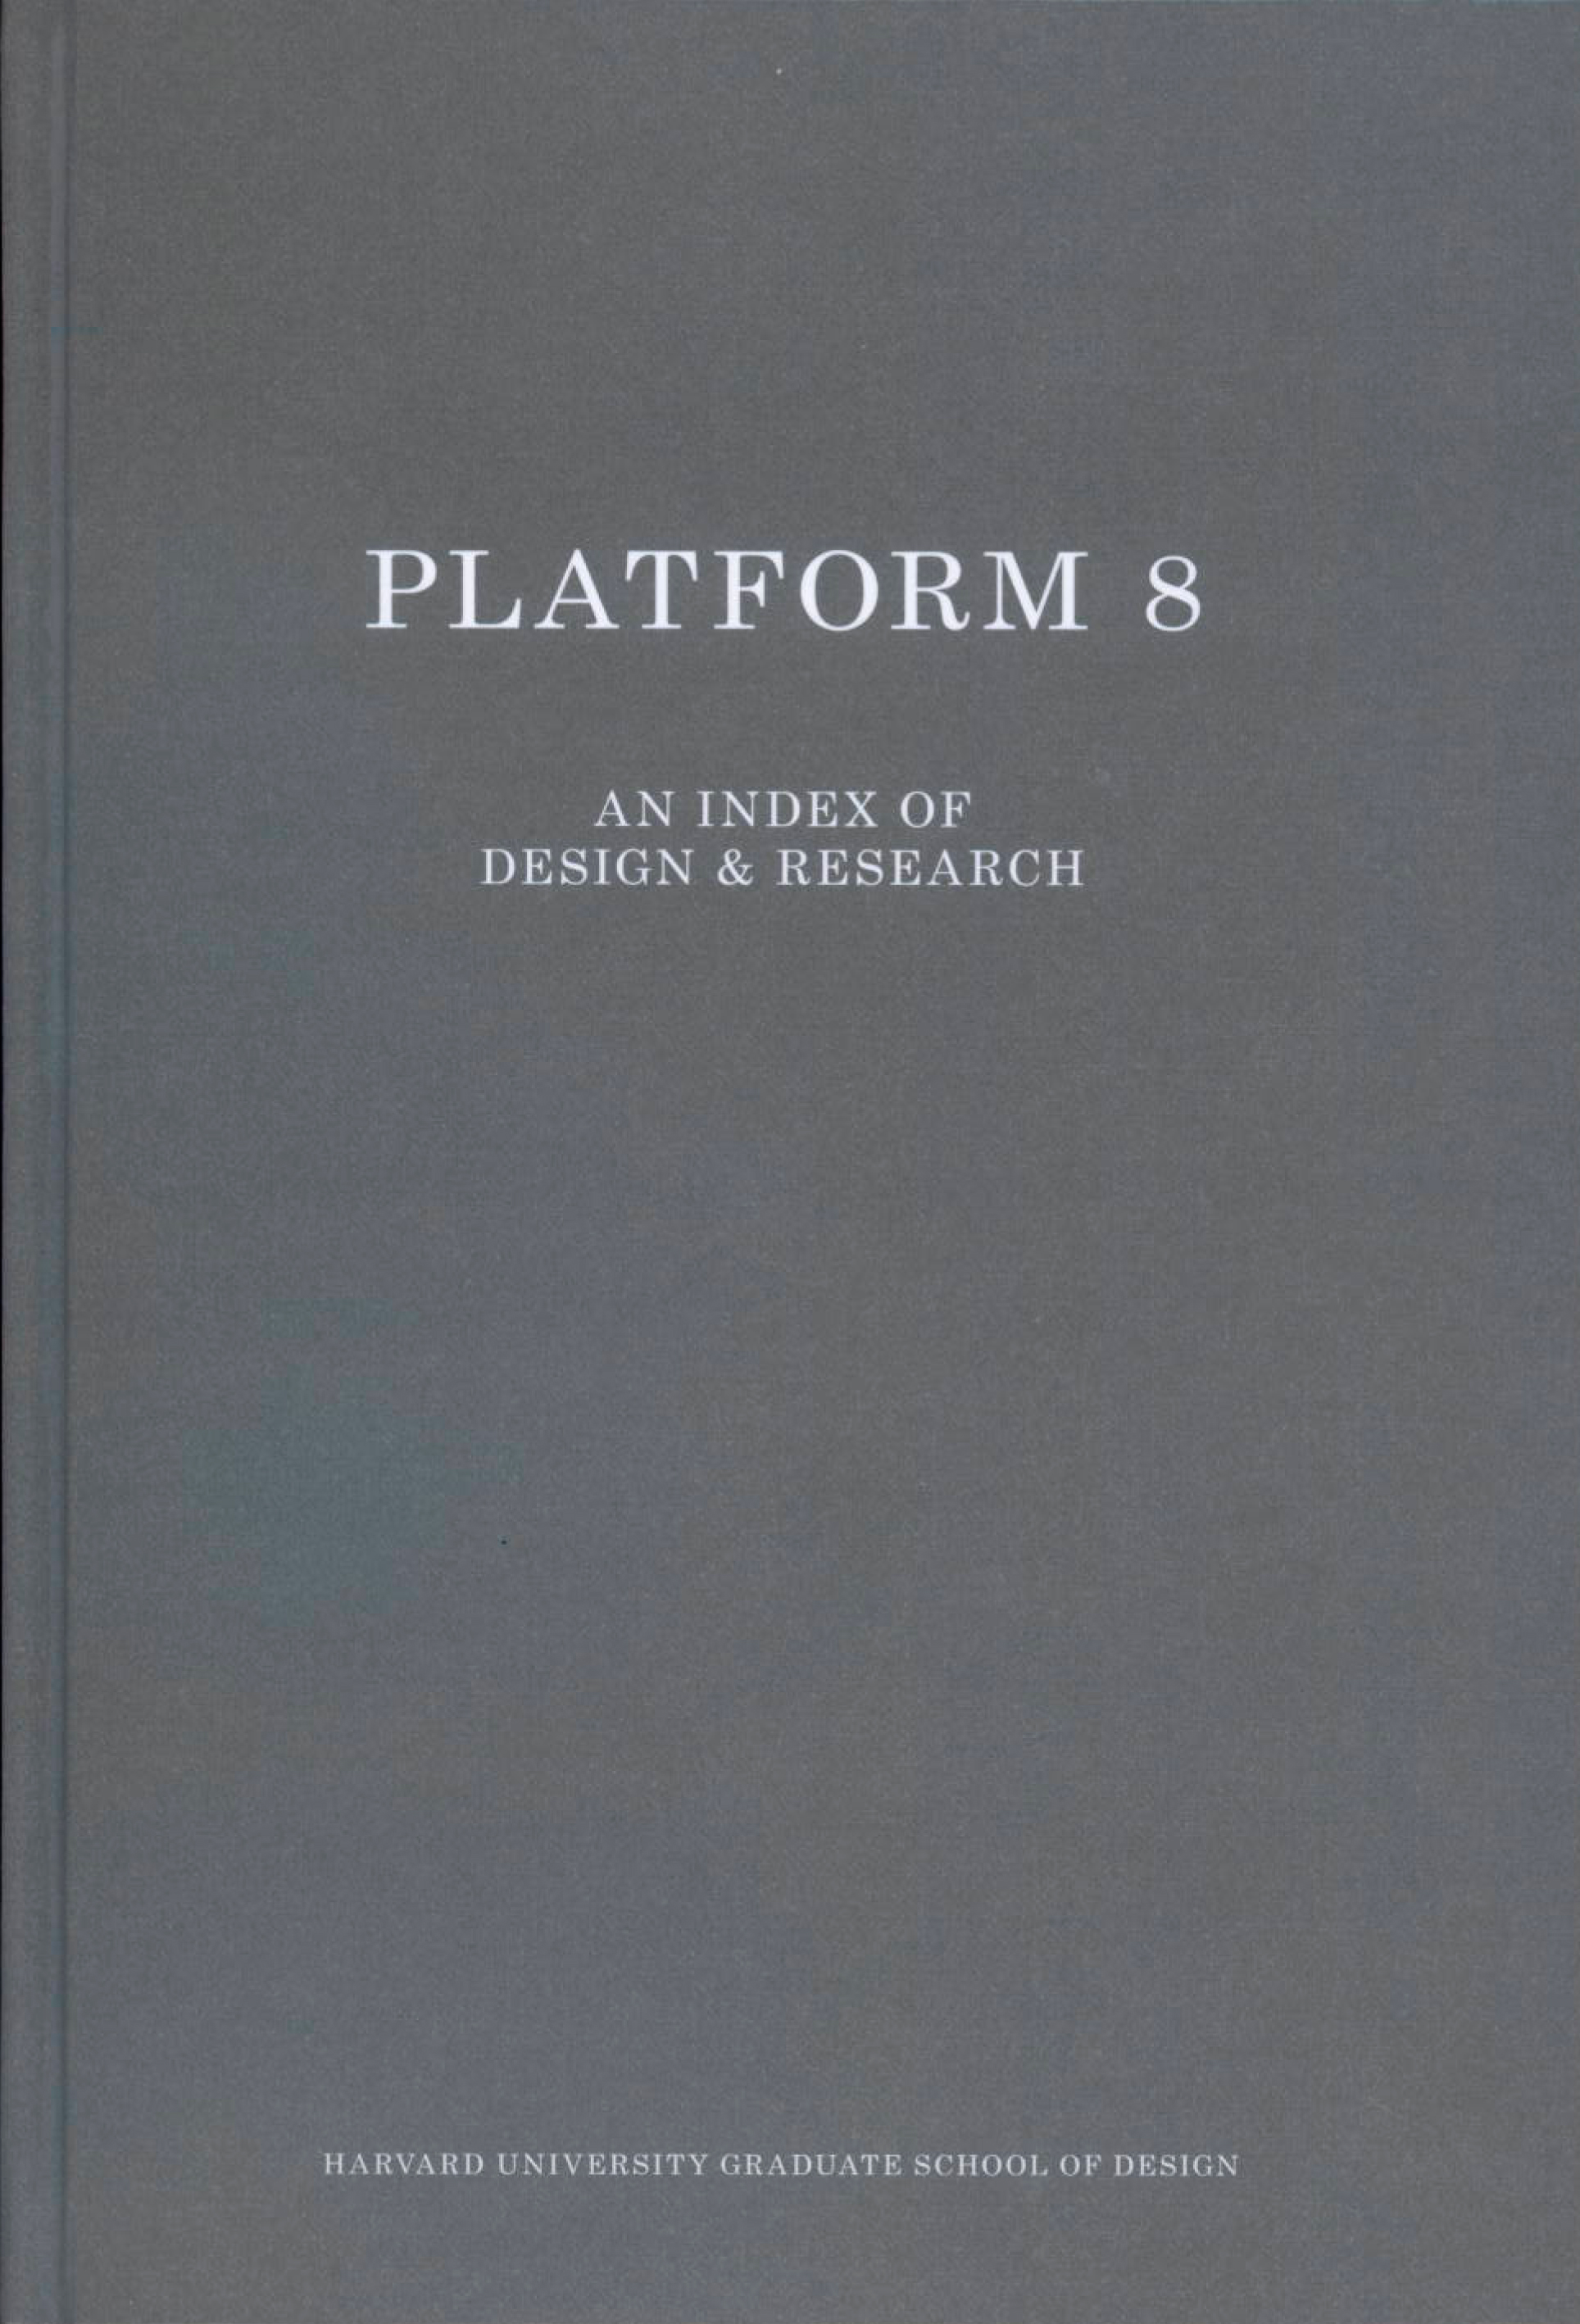 GSD Platform 8